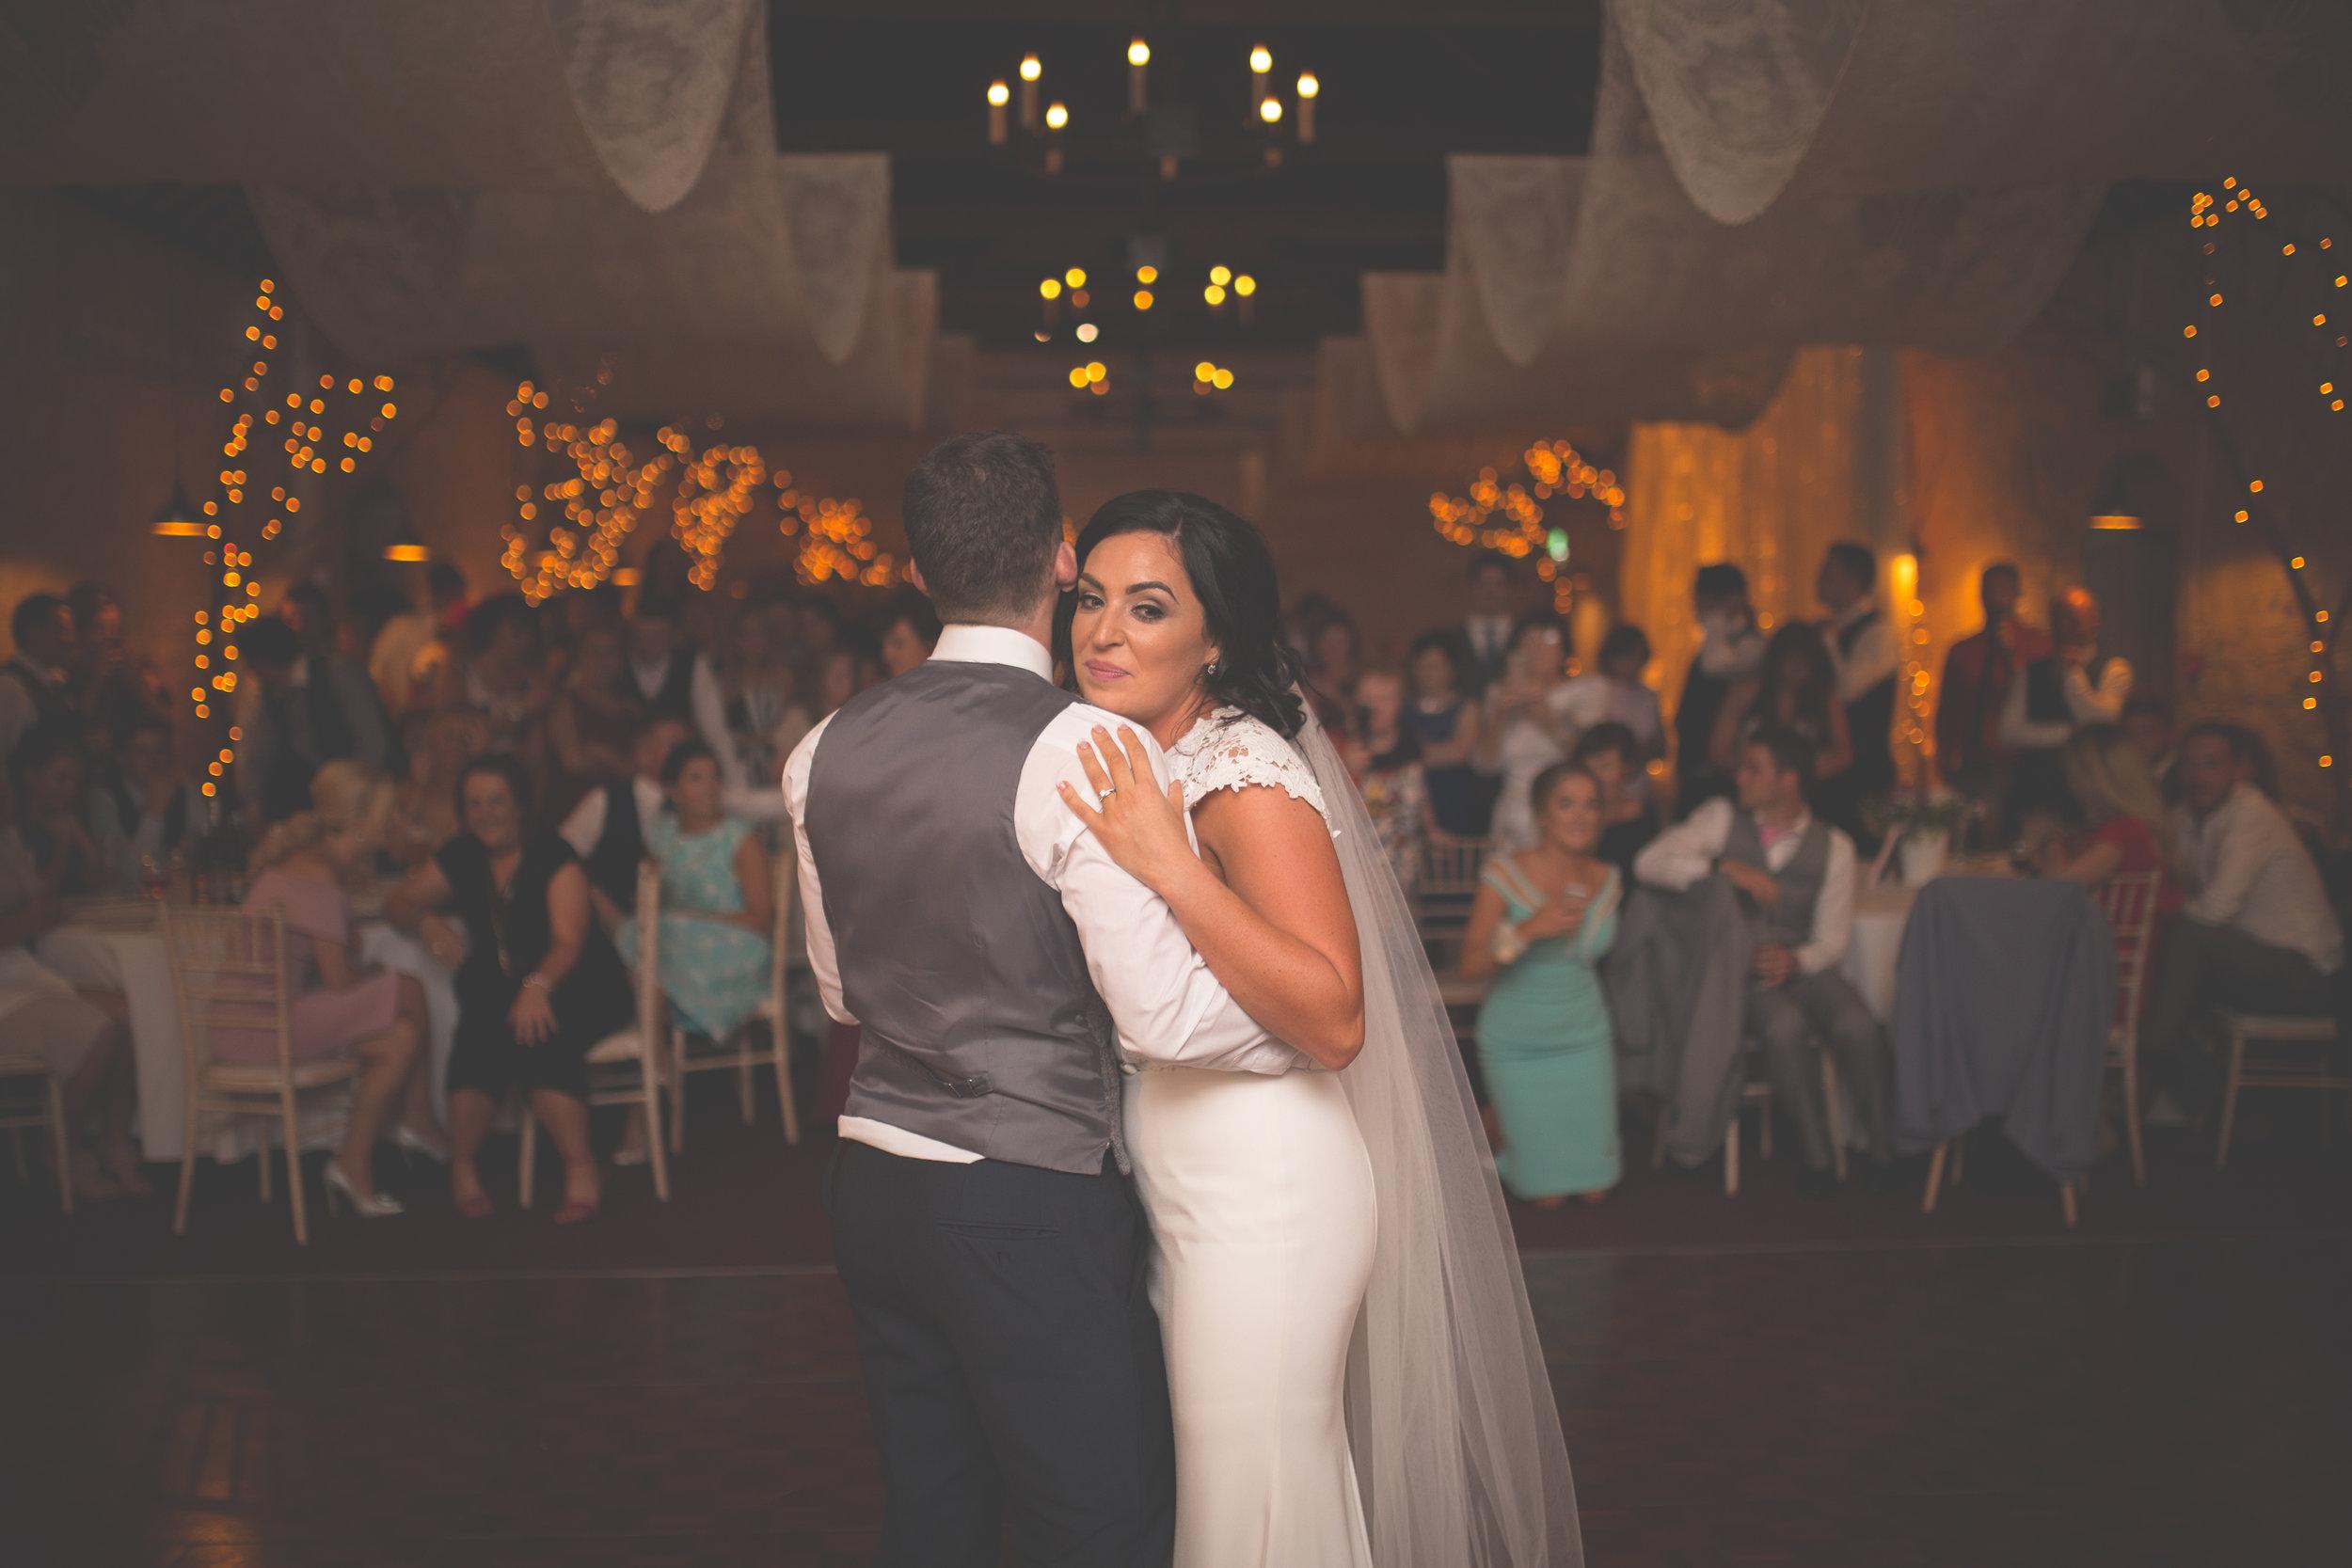 Brian McEwan Wedding Photography | Carol-Annee & Sean | The Dancing-29.jpg